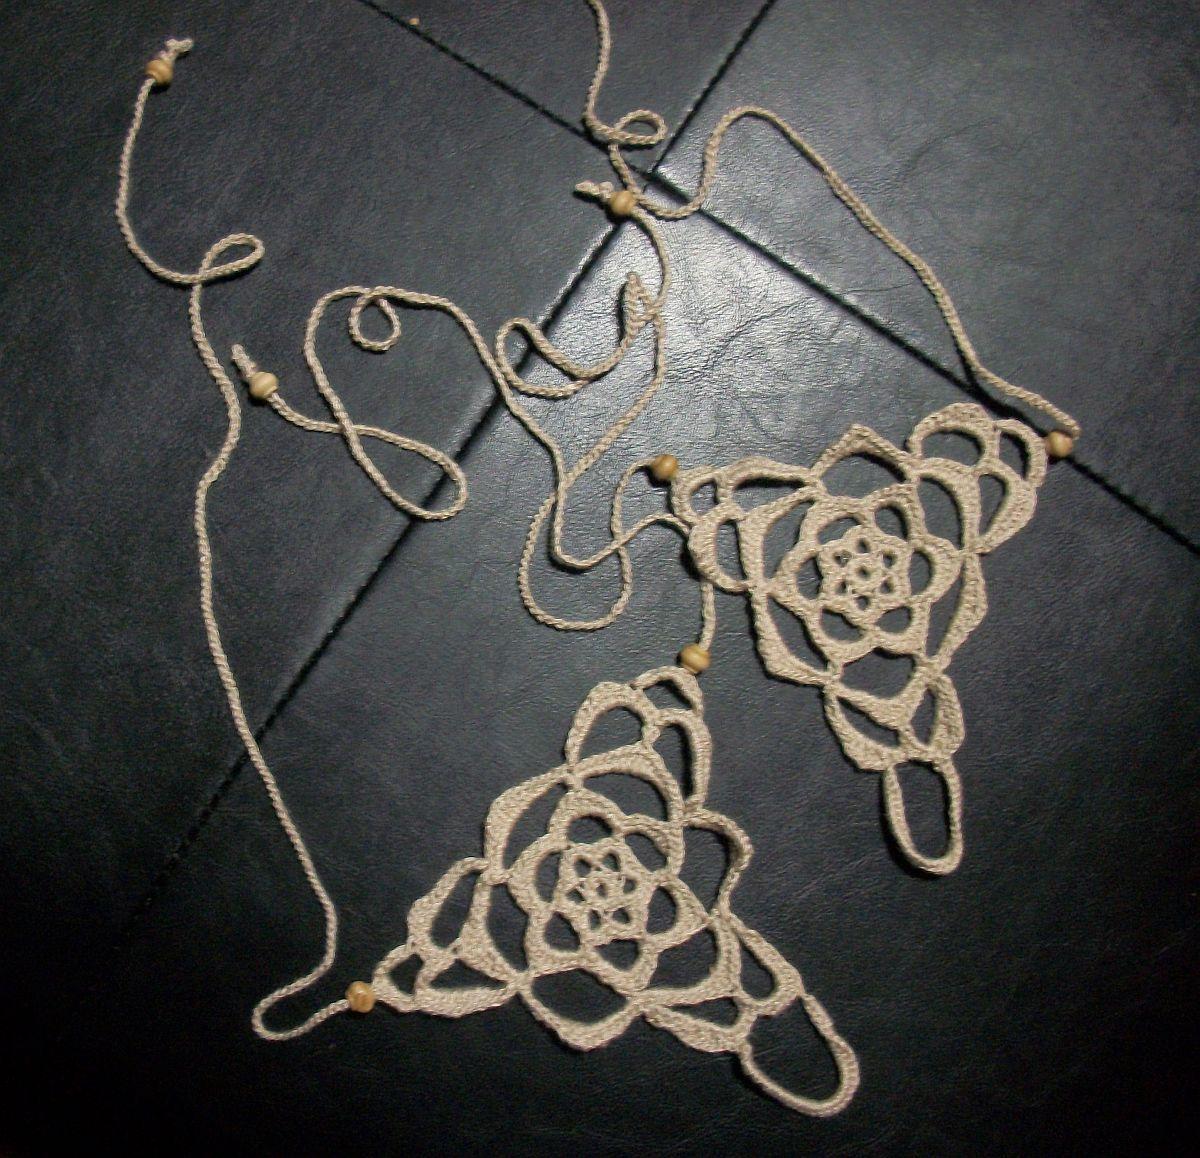 30+ Awesome Crochet Barefoot Sandals Patterns | Barefoot, Crochet ...